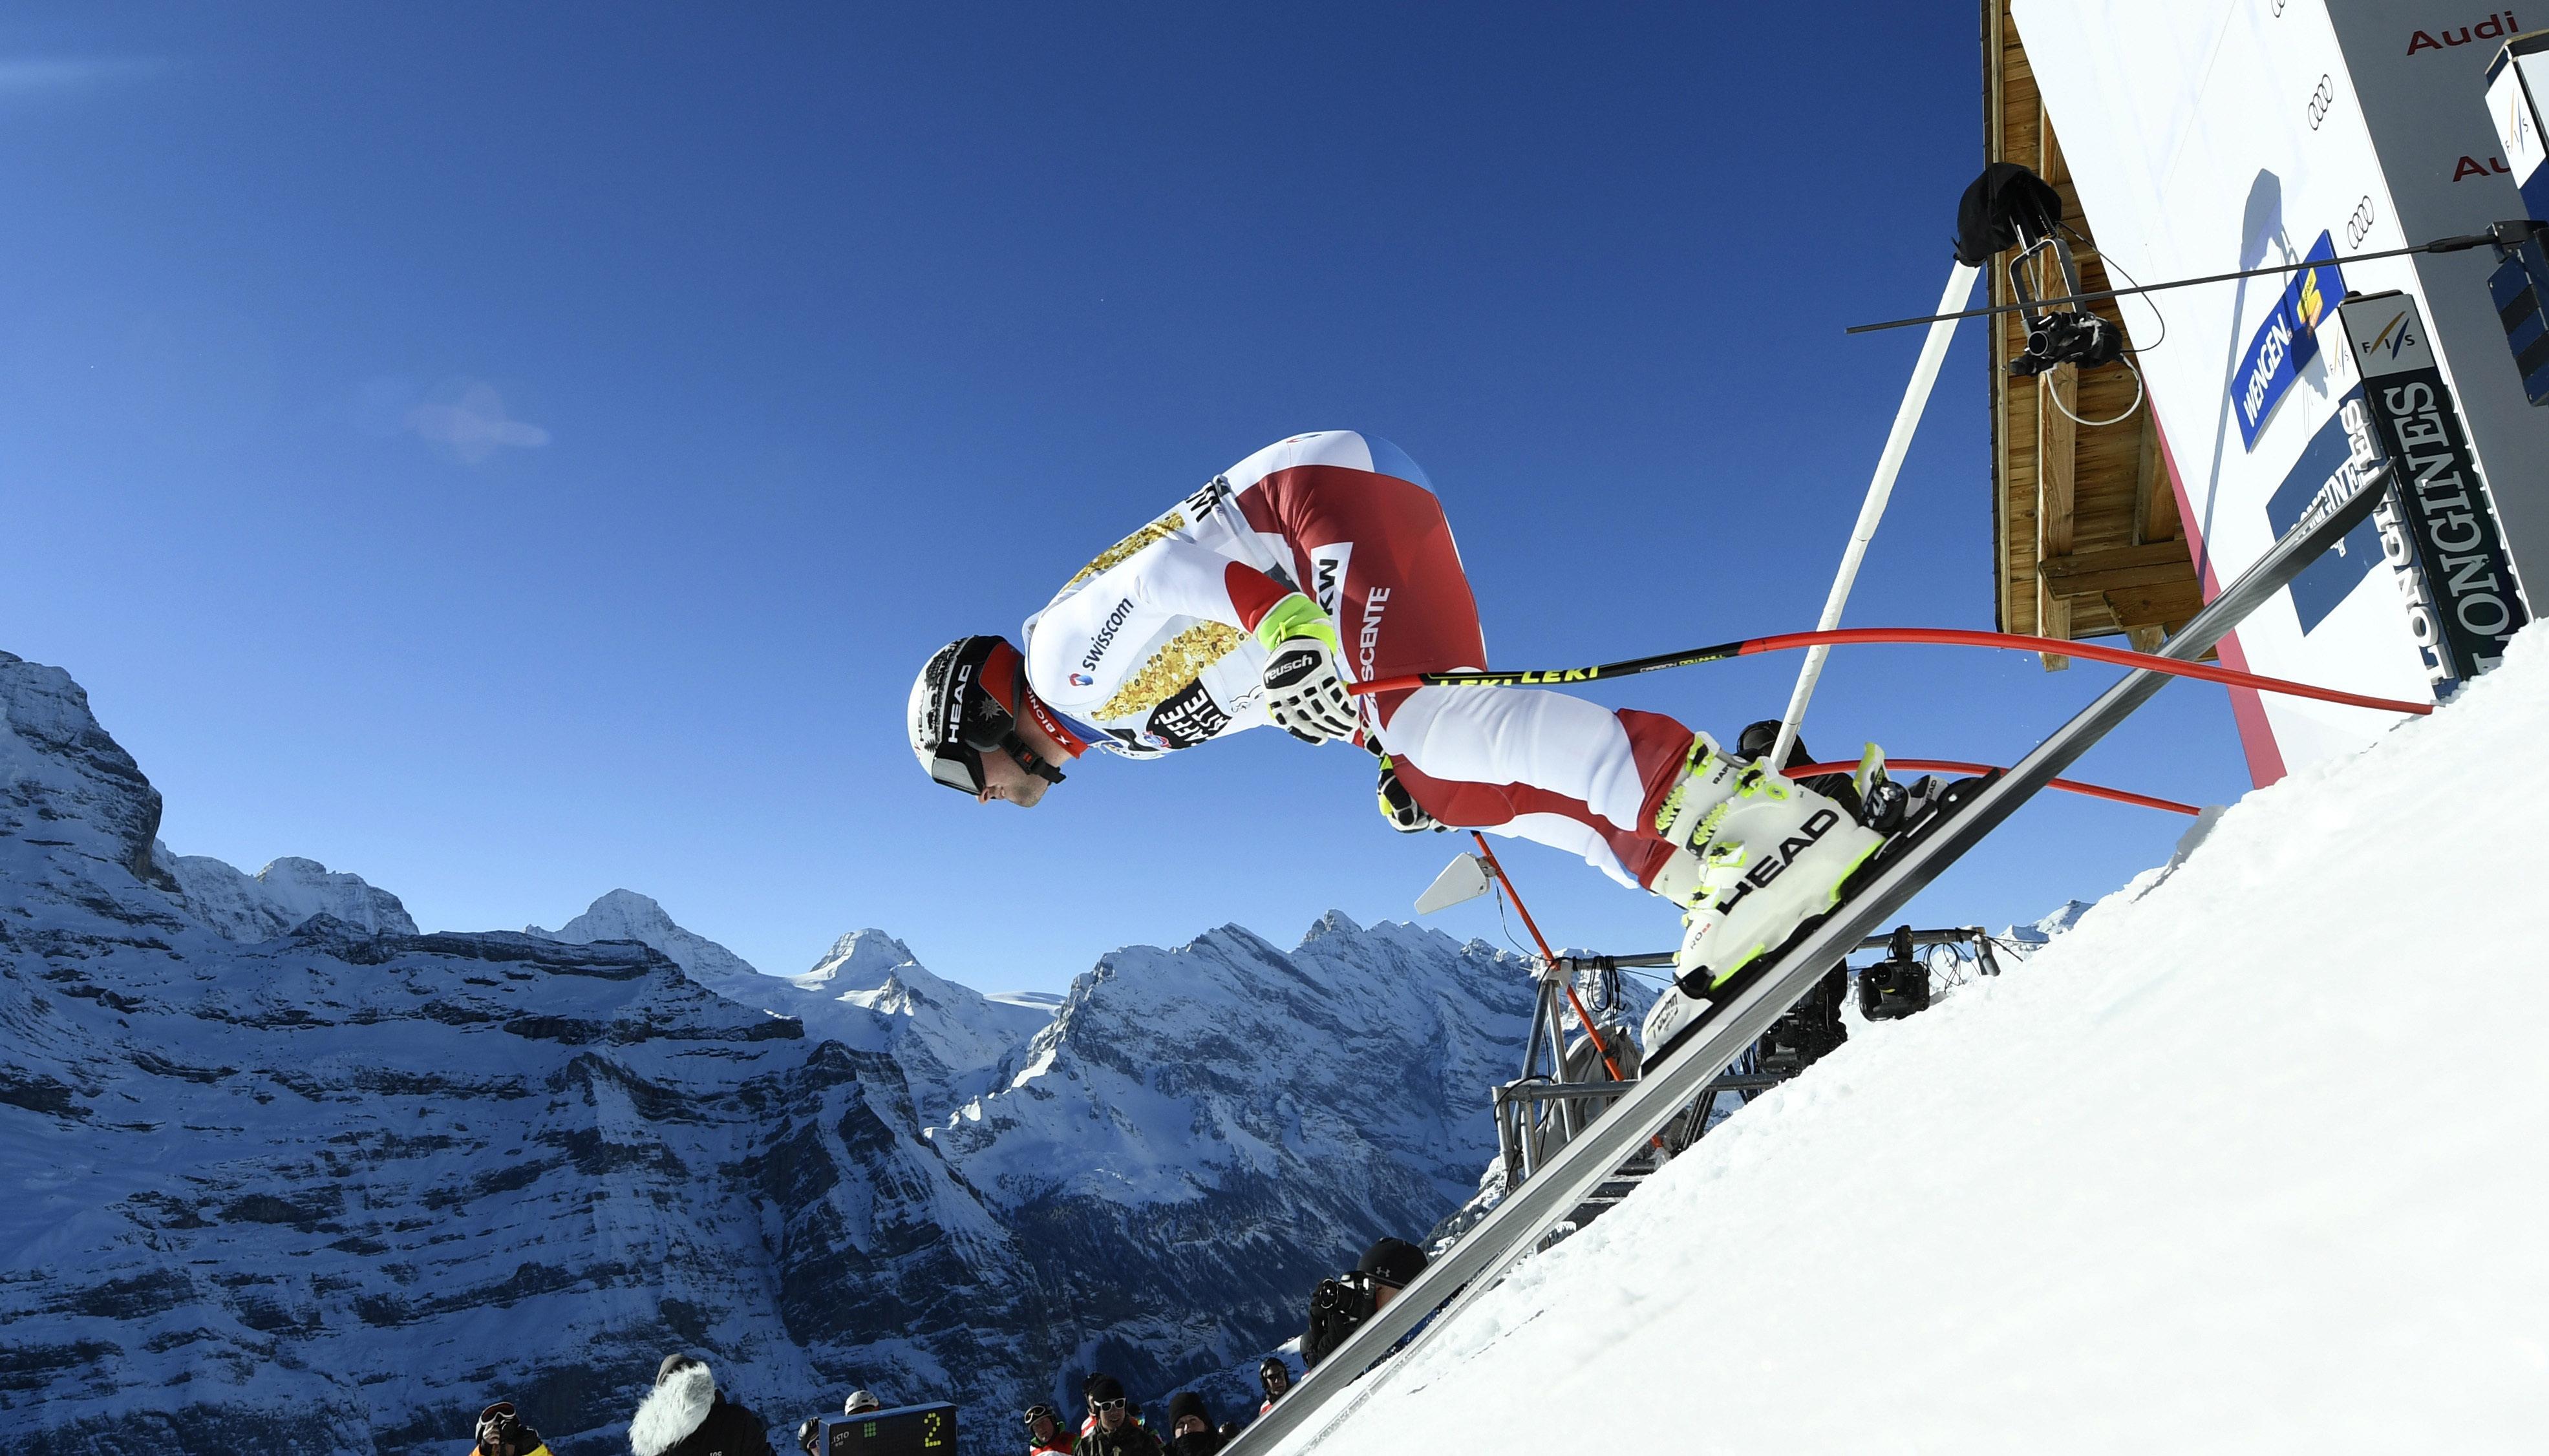 Ski Alpin: Jetzt kommen die Klassiker